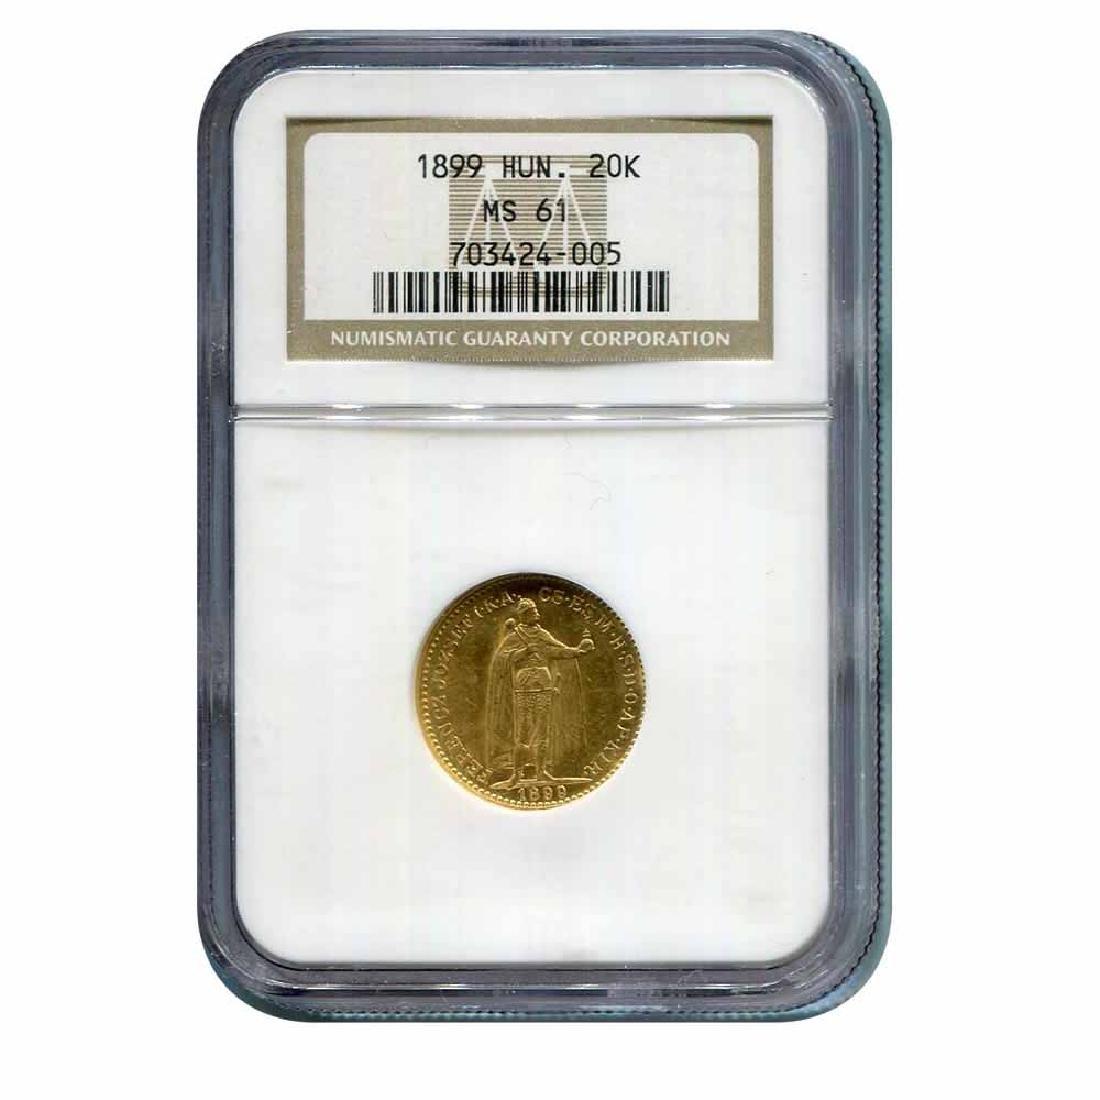 Hungary 20 Korona Gold 1899 MS61